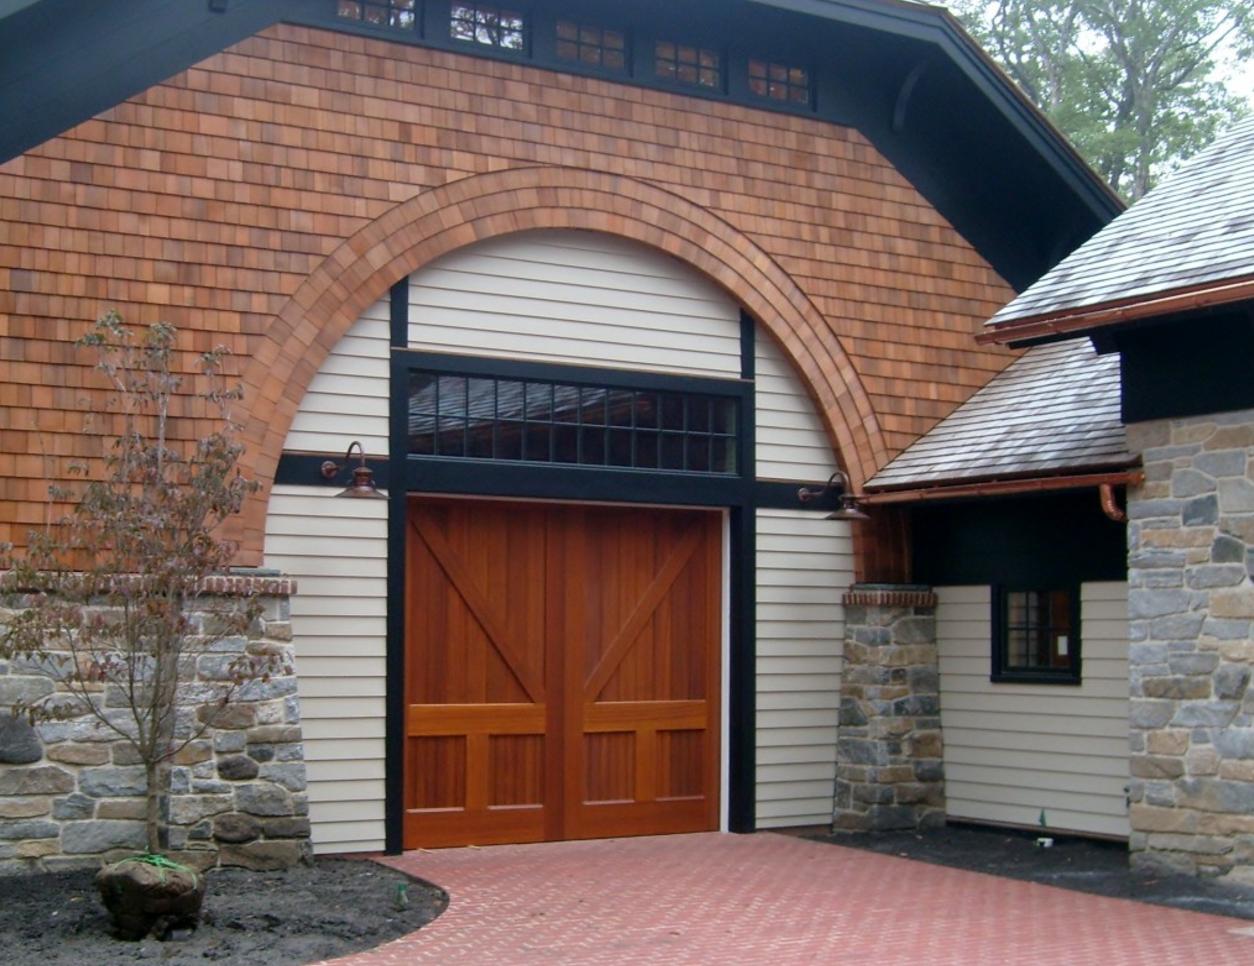 http://blog.barnlightelectric.com/professionals-corner-qa-with-daniel-contelmo-architects/